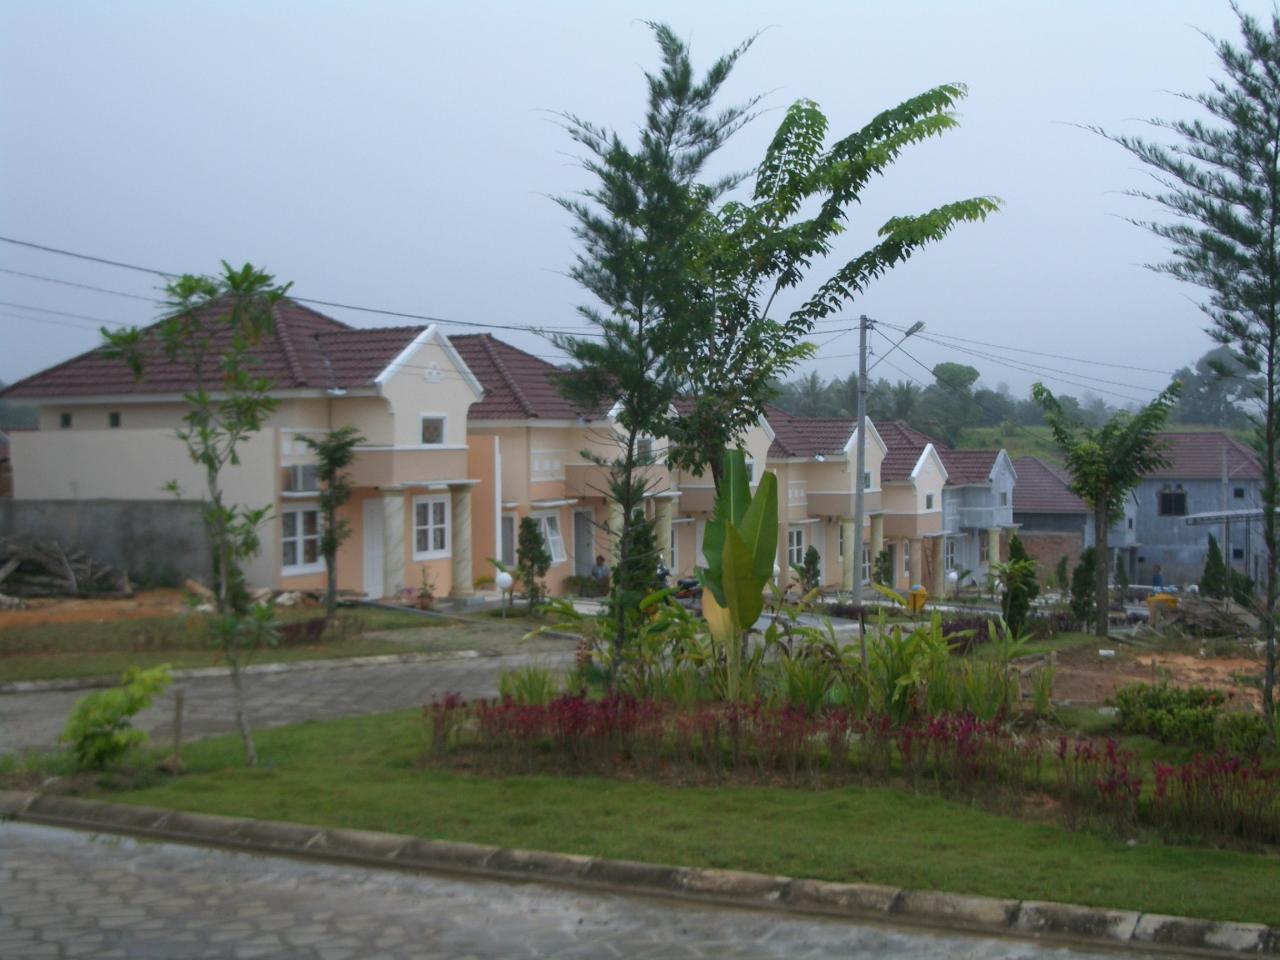 Suasana Lingkungan Villa Gading Mayang